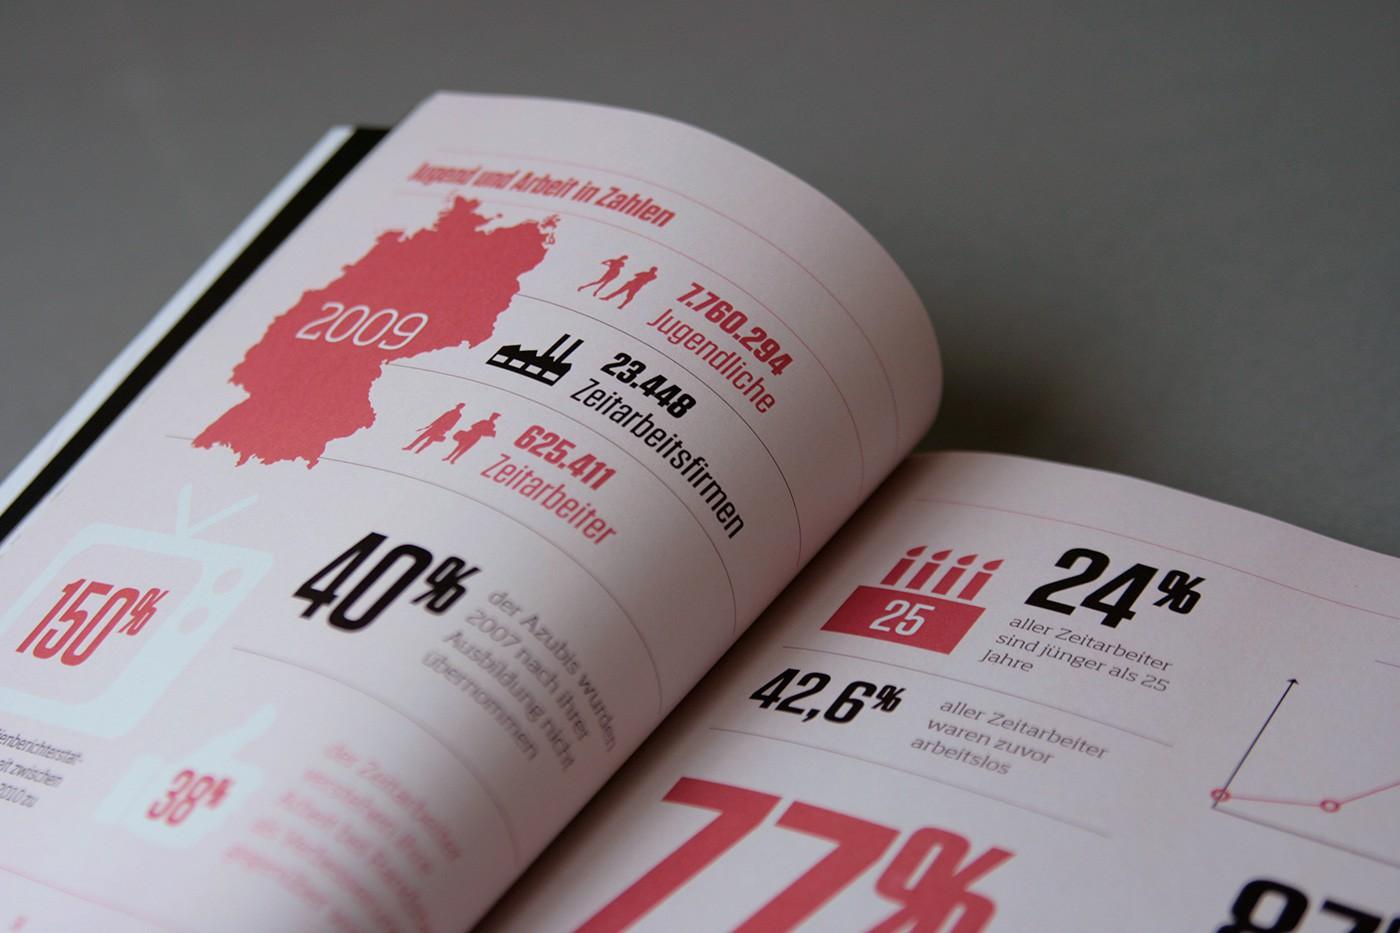 Unstitute / Randstad Book design by upstruct